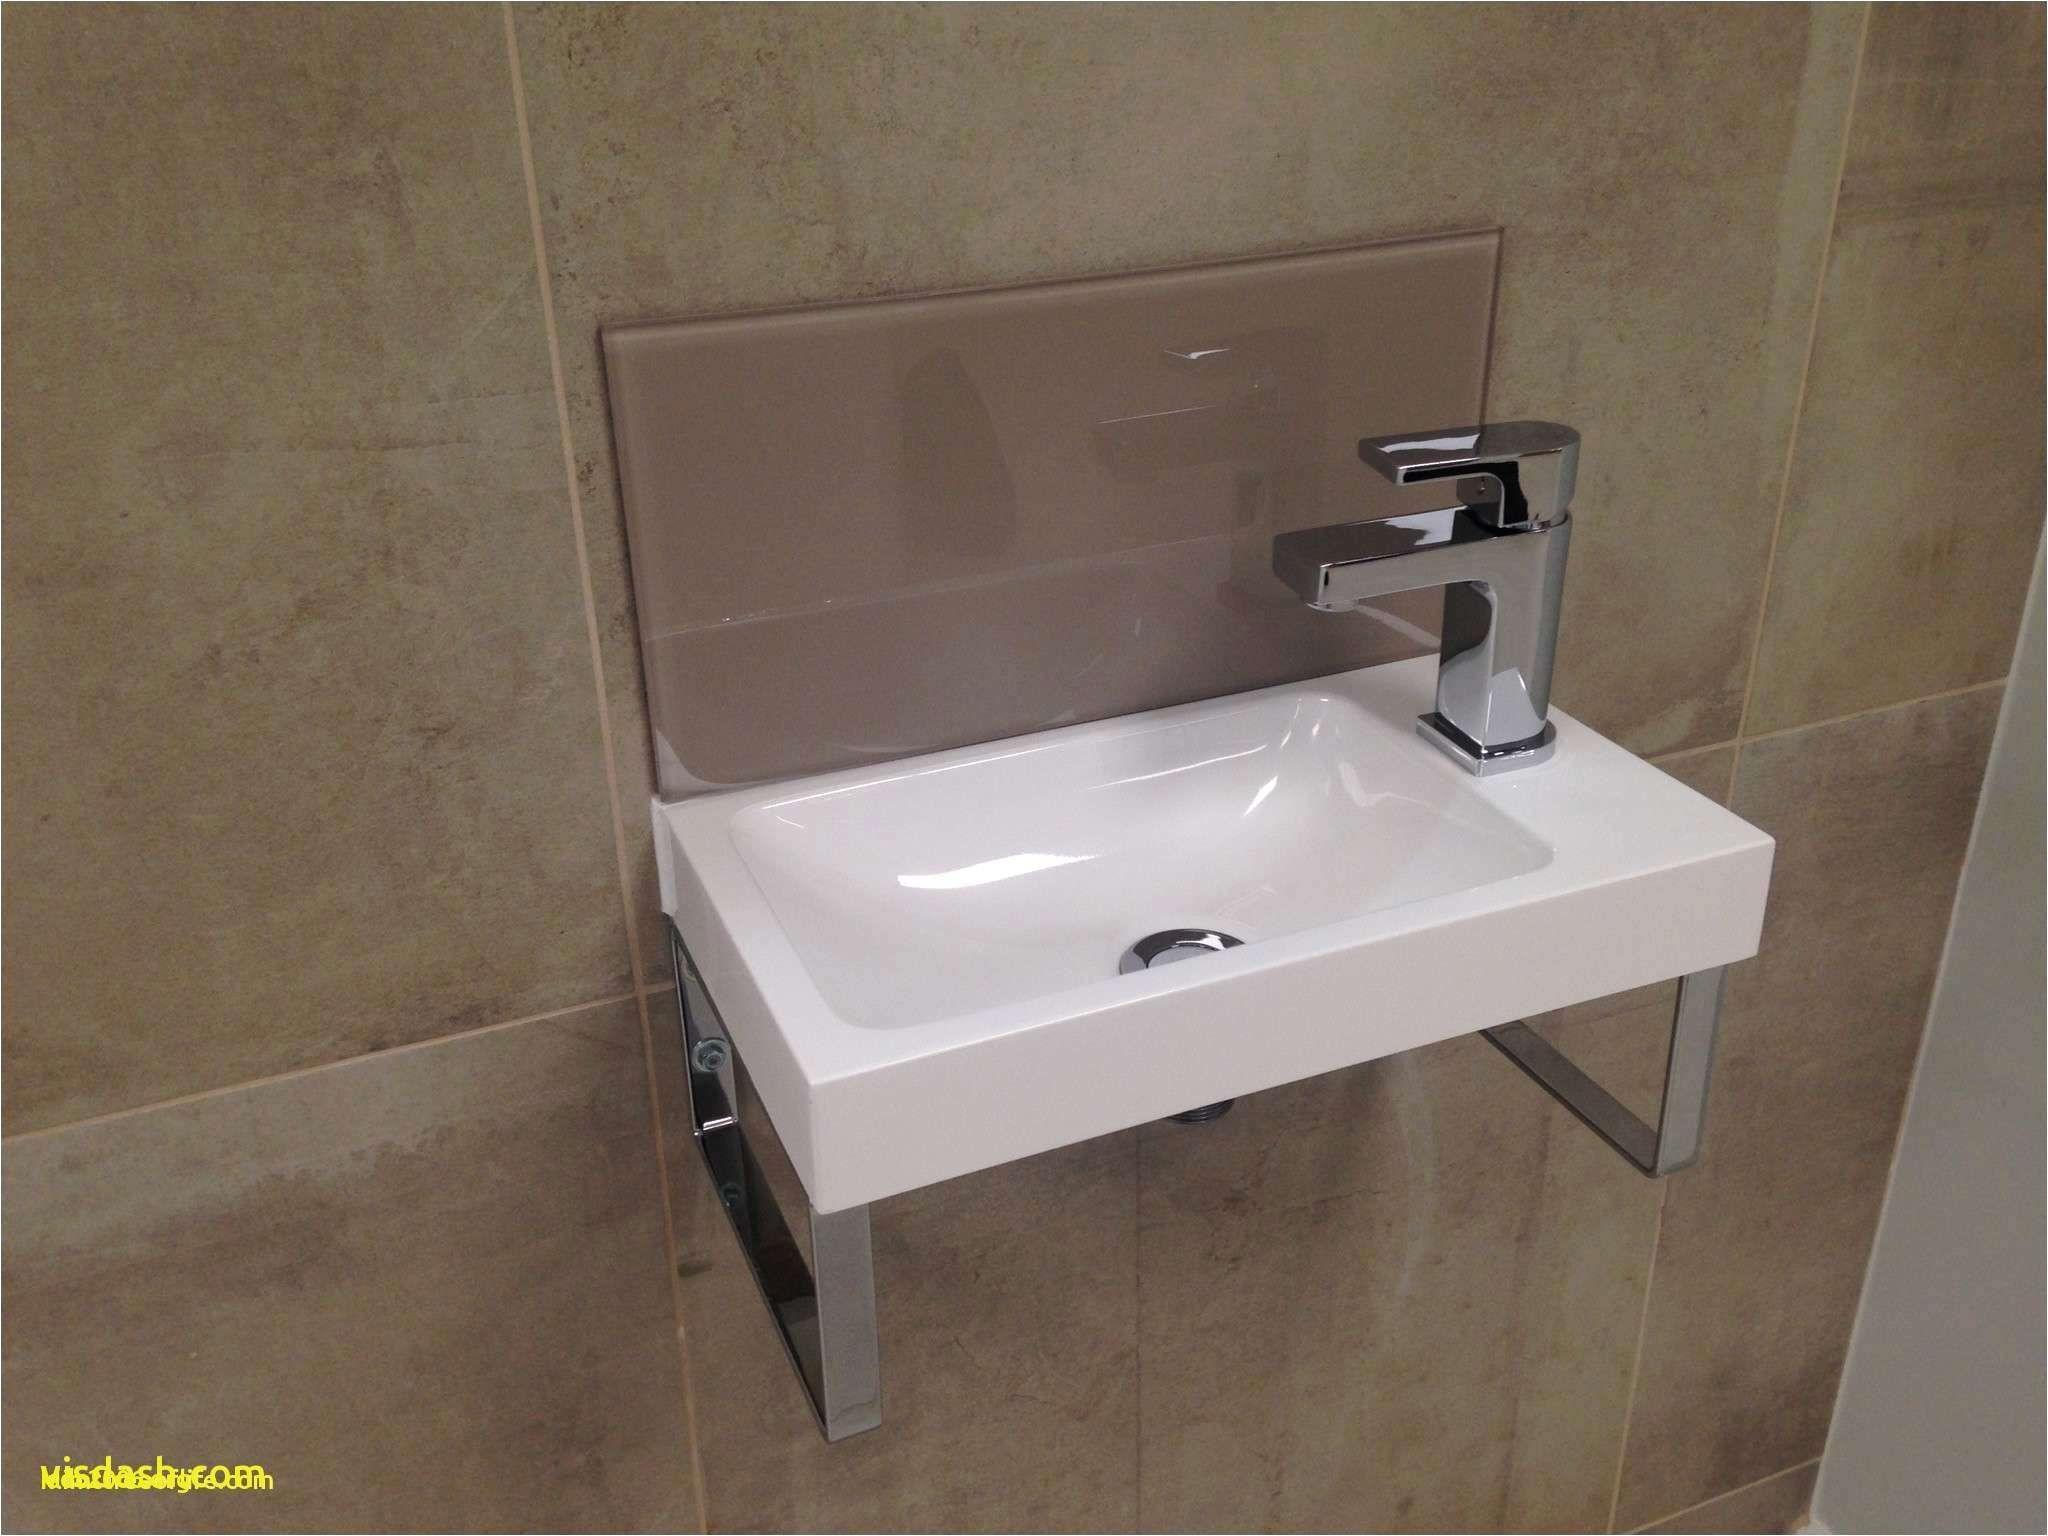 Bathroom Vanity Light Fixtures Inspirational Small Bathroom Lighting Fresh Tag toilet Ideas 0d Best Bathroom Image